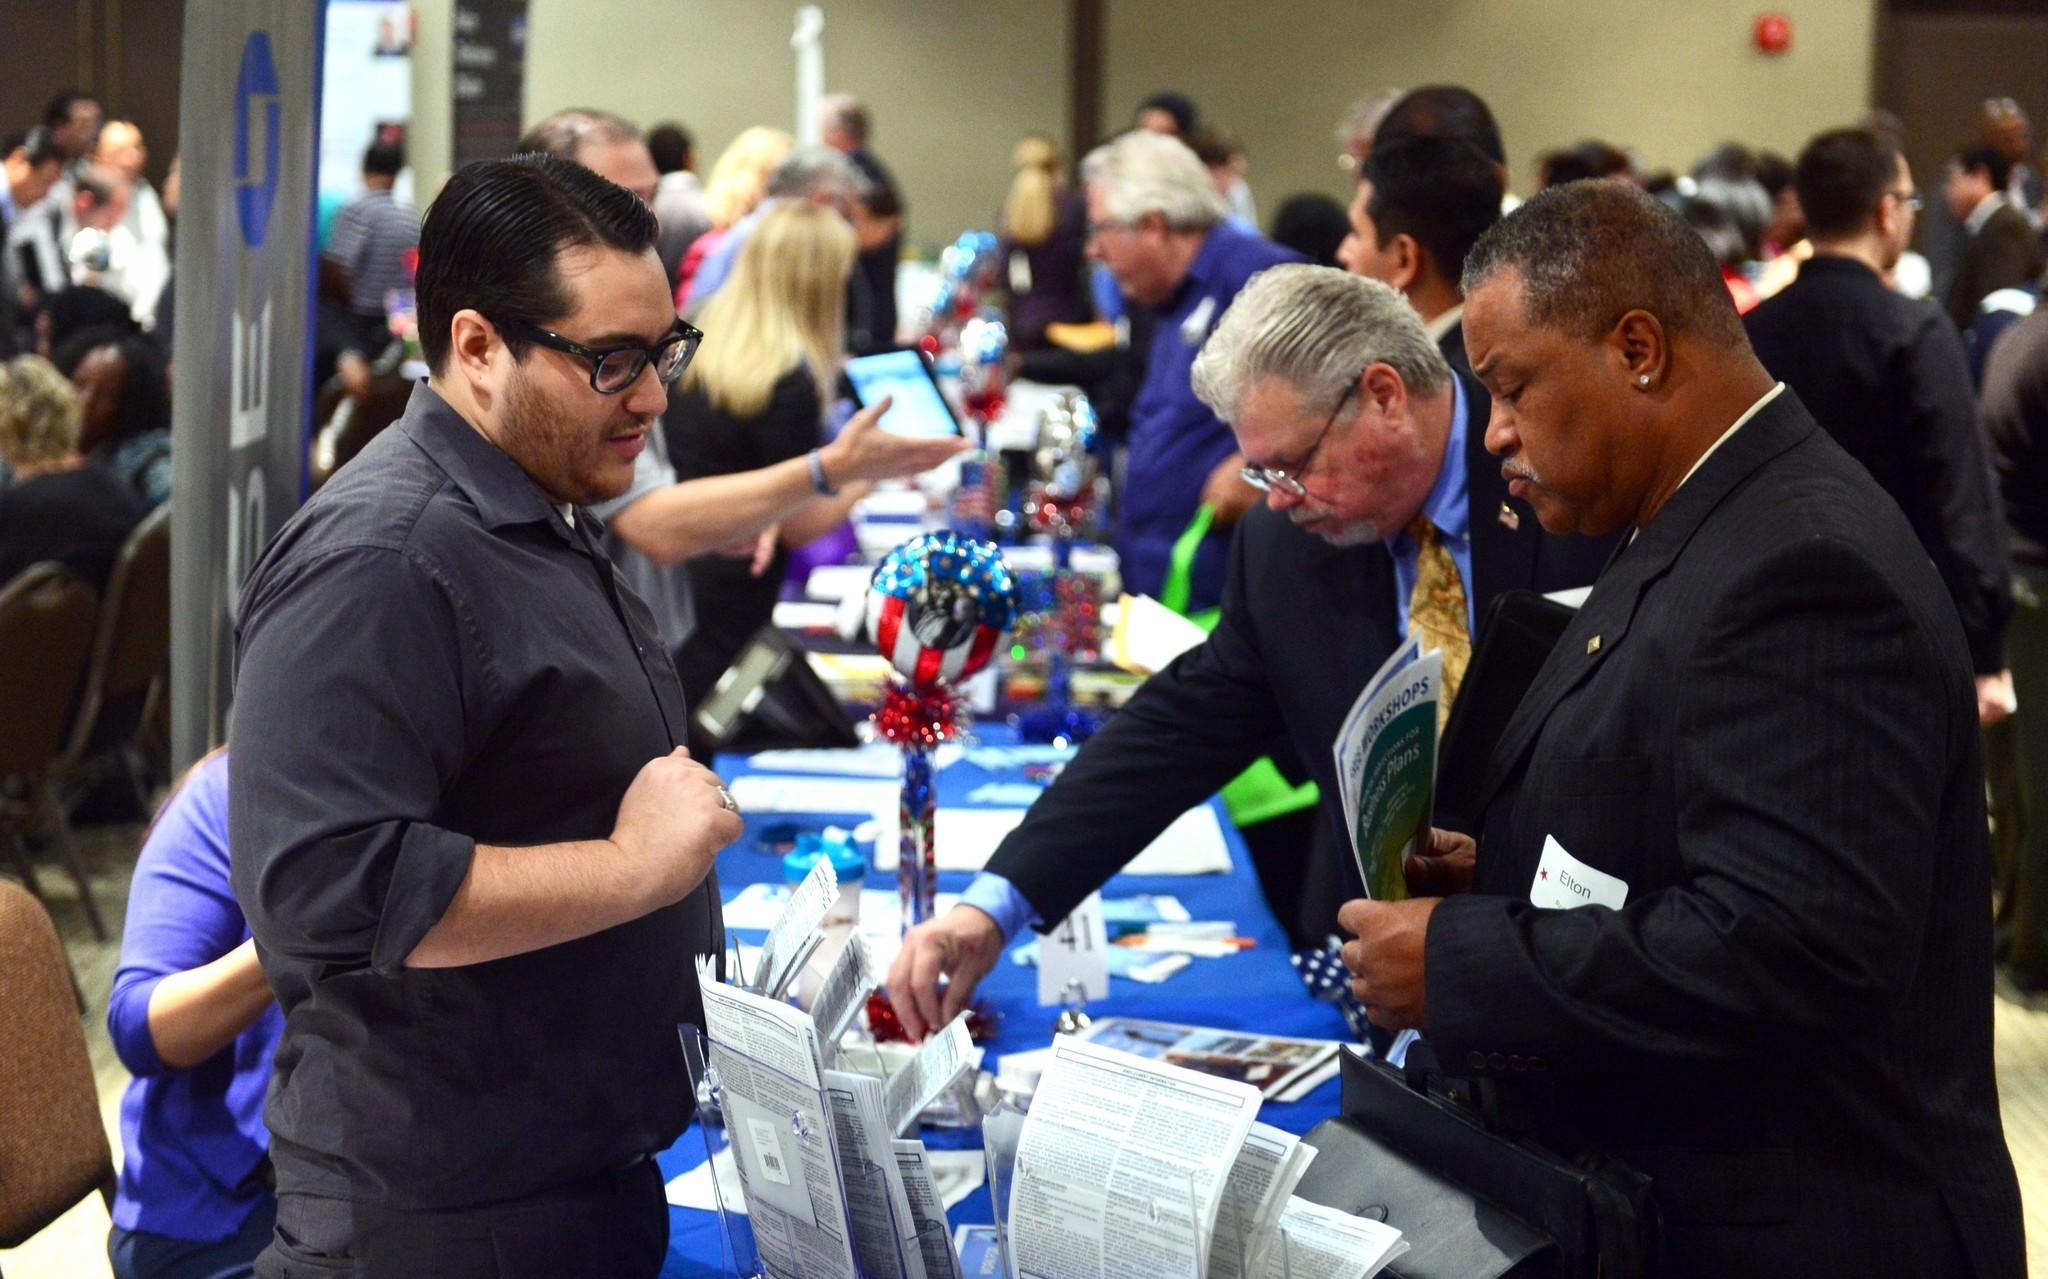 Prospective job seekers meet at a hiring event in Van Nuys.